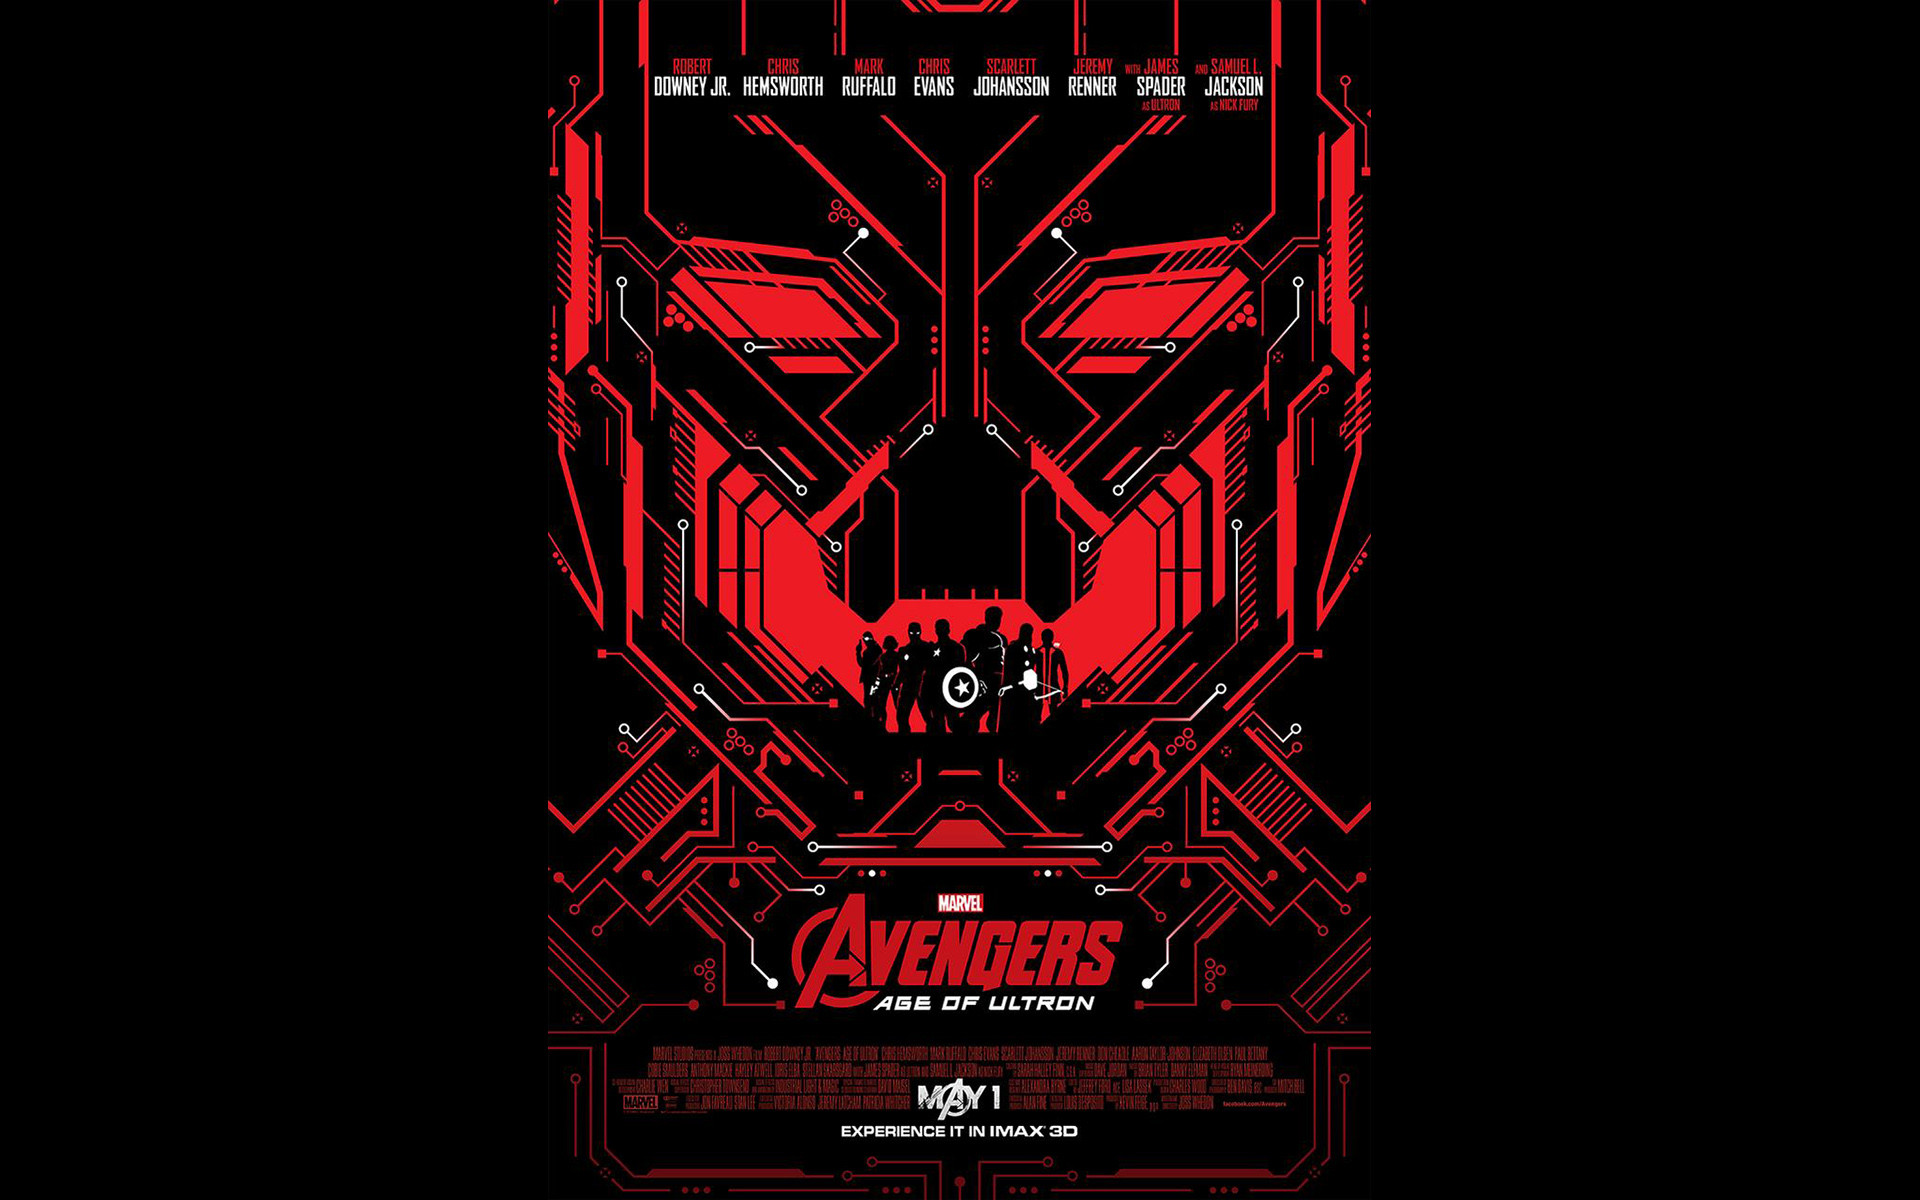 2015 Avengers Age of Ultron IMAX